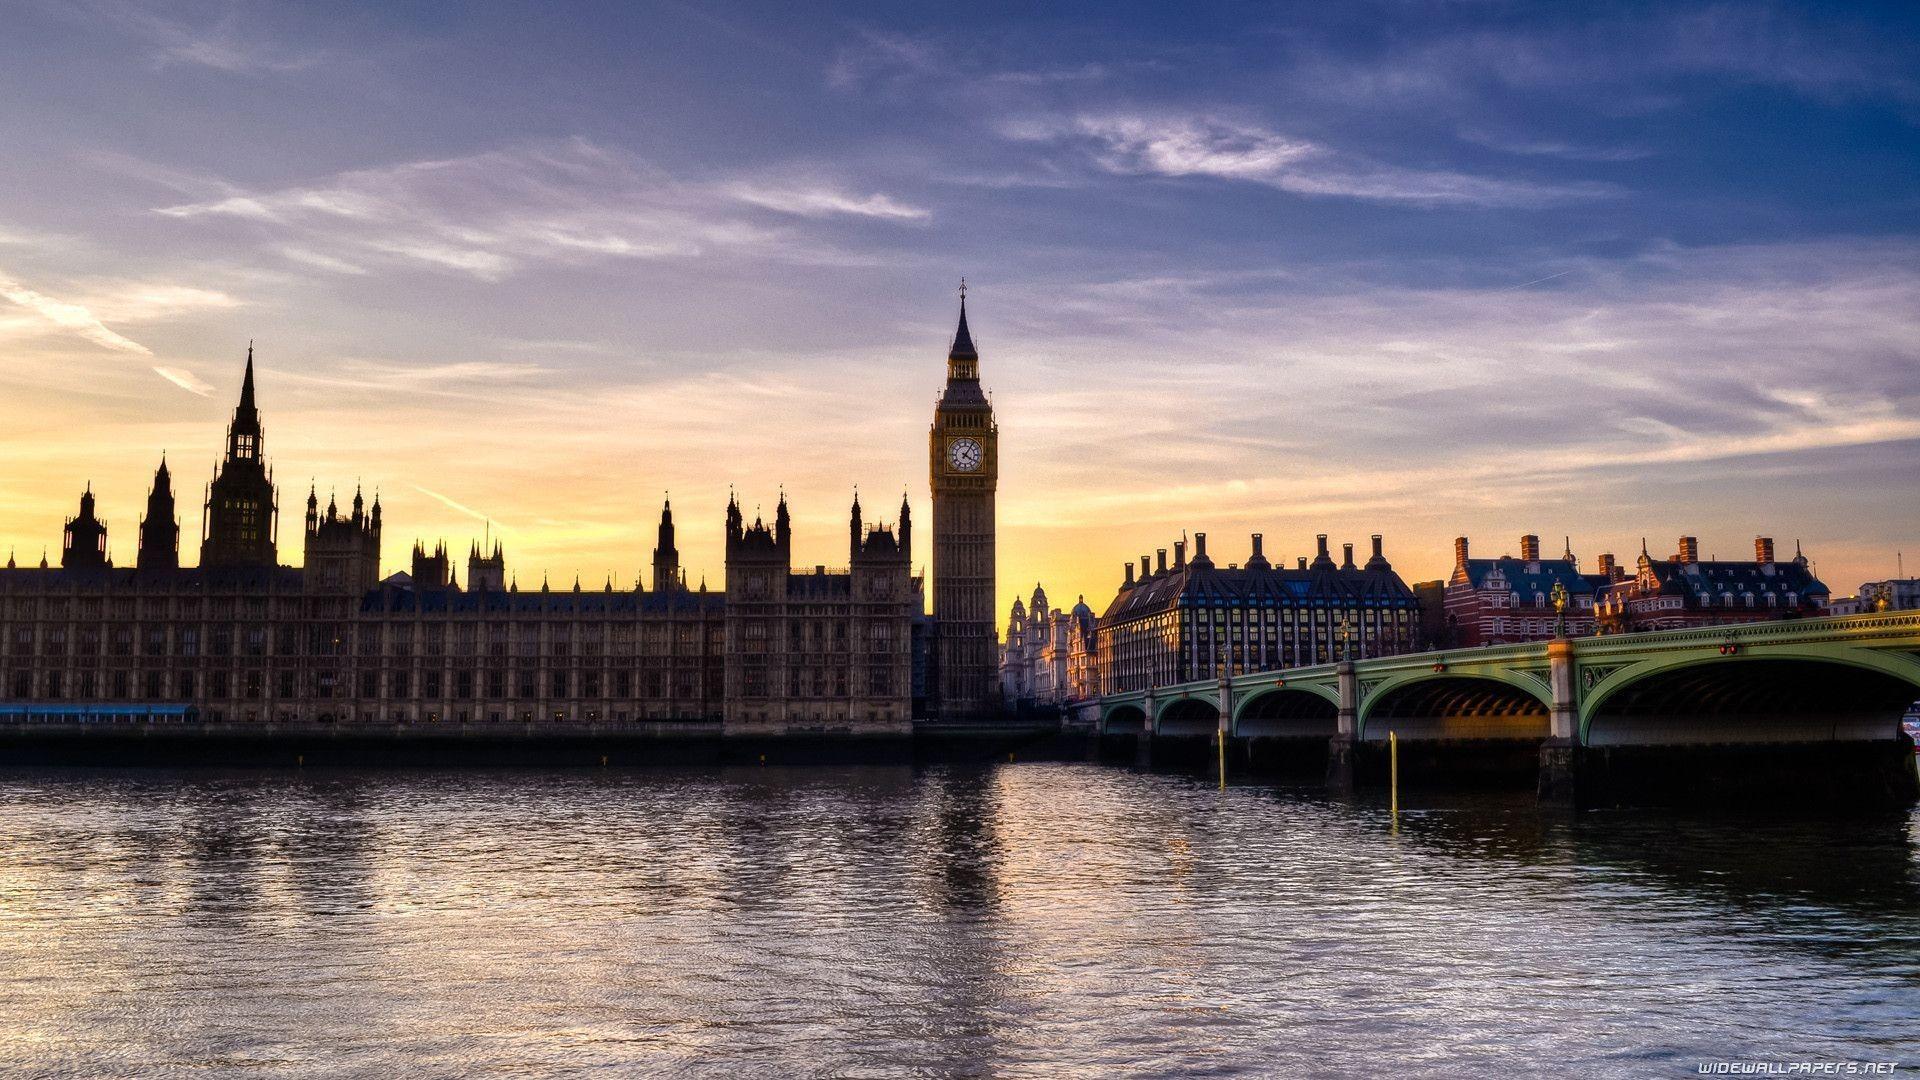 London wallpaper ·① Download free amazing High Resolution ...